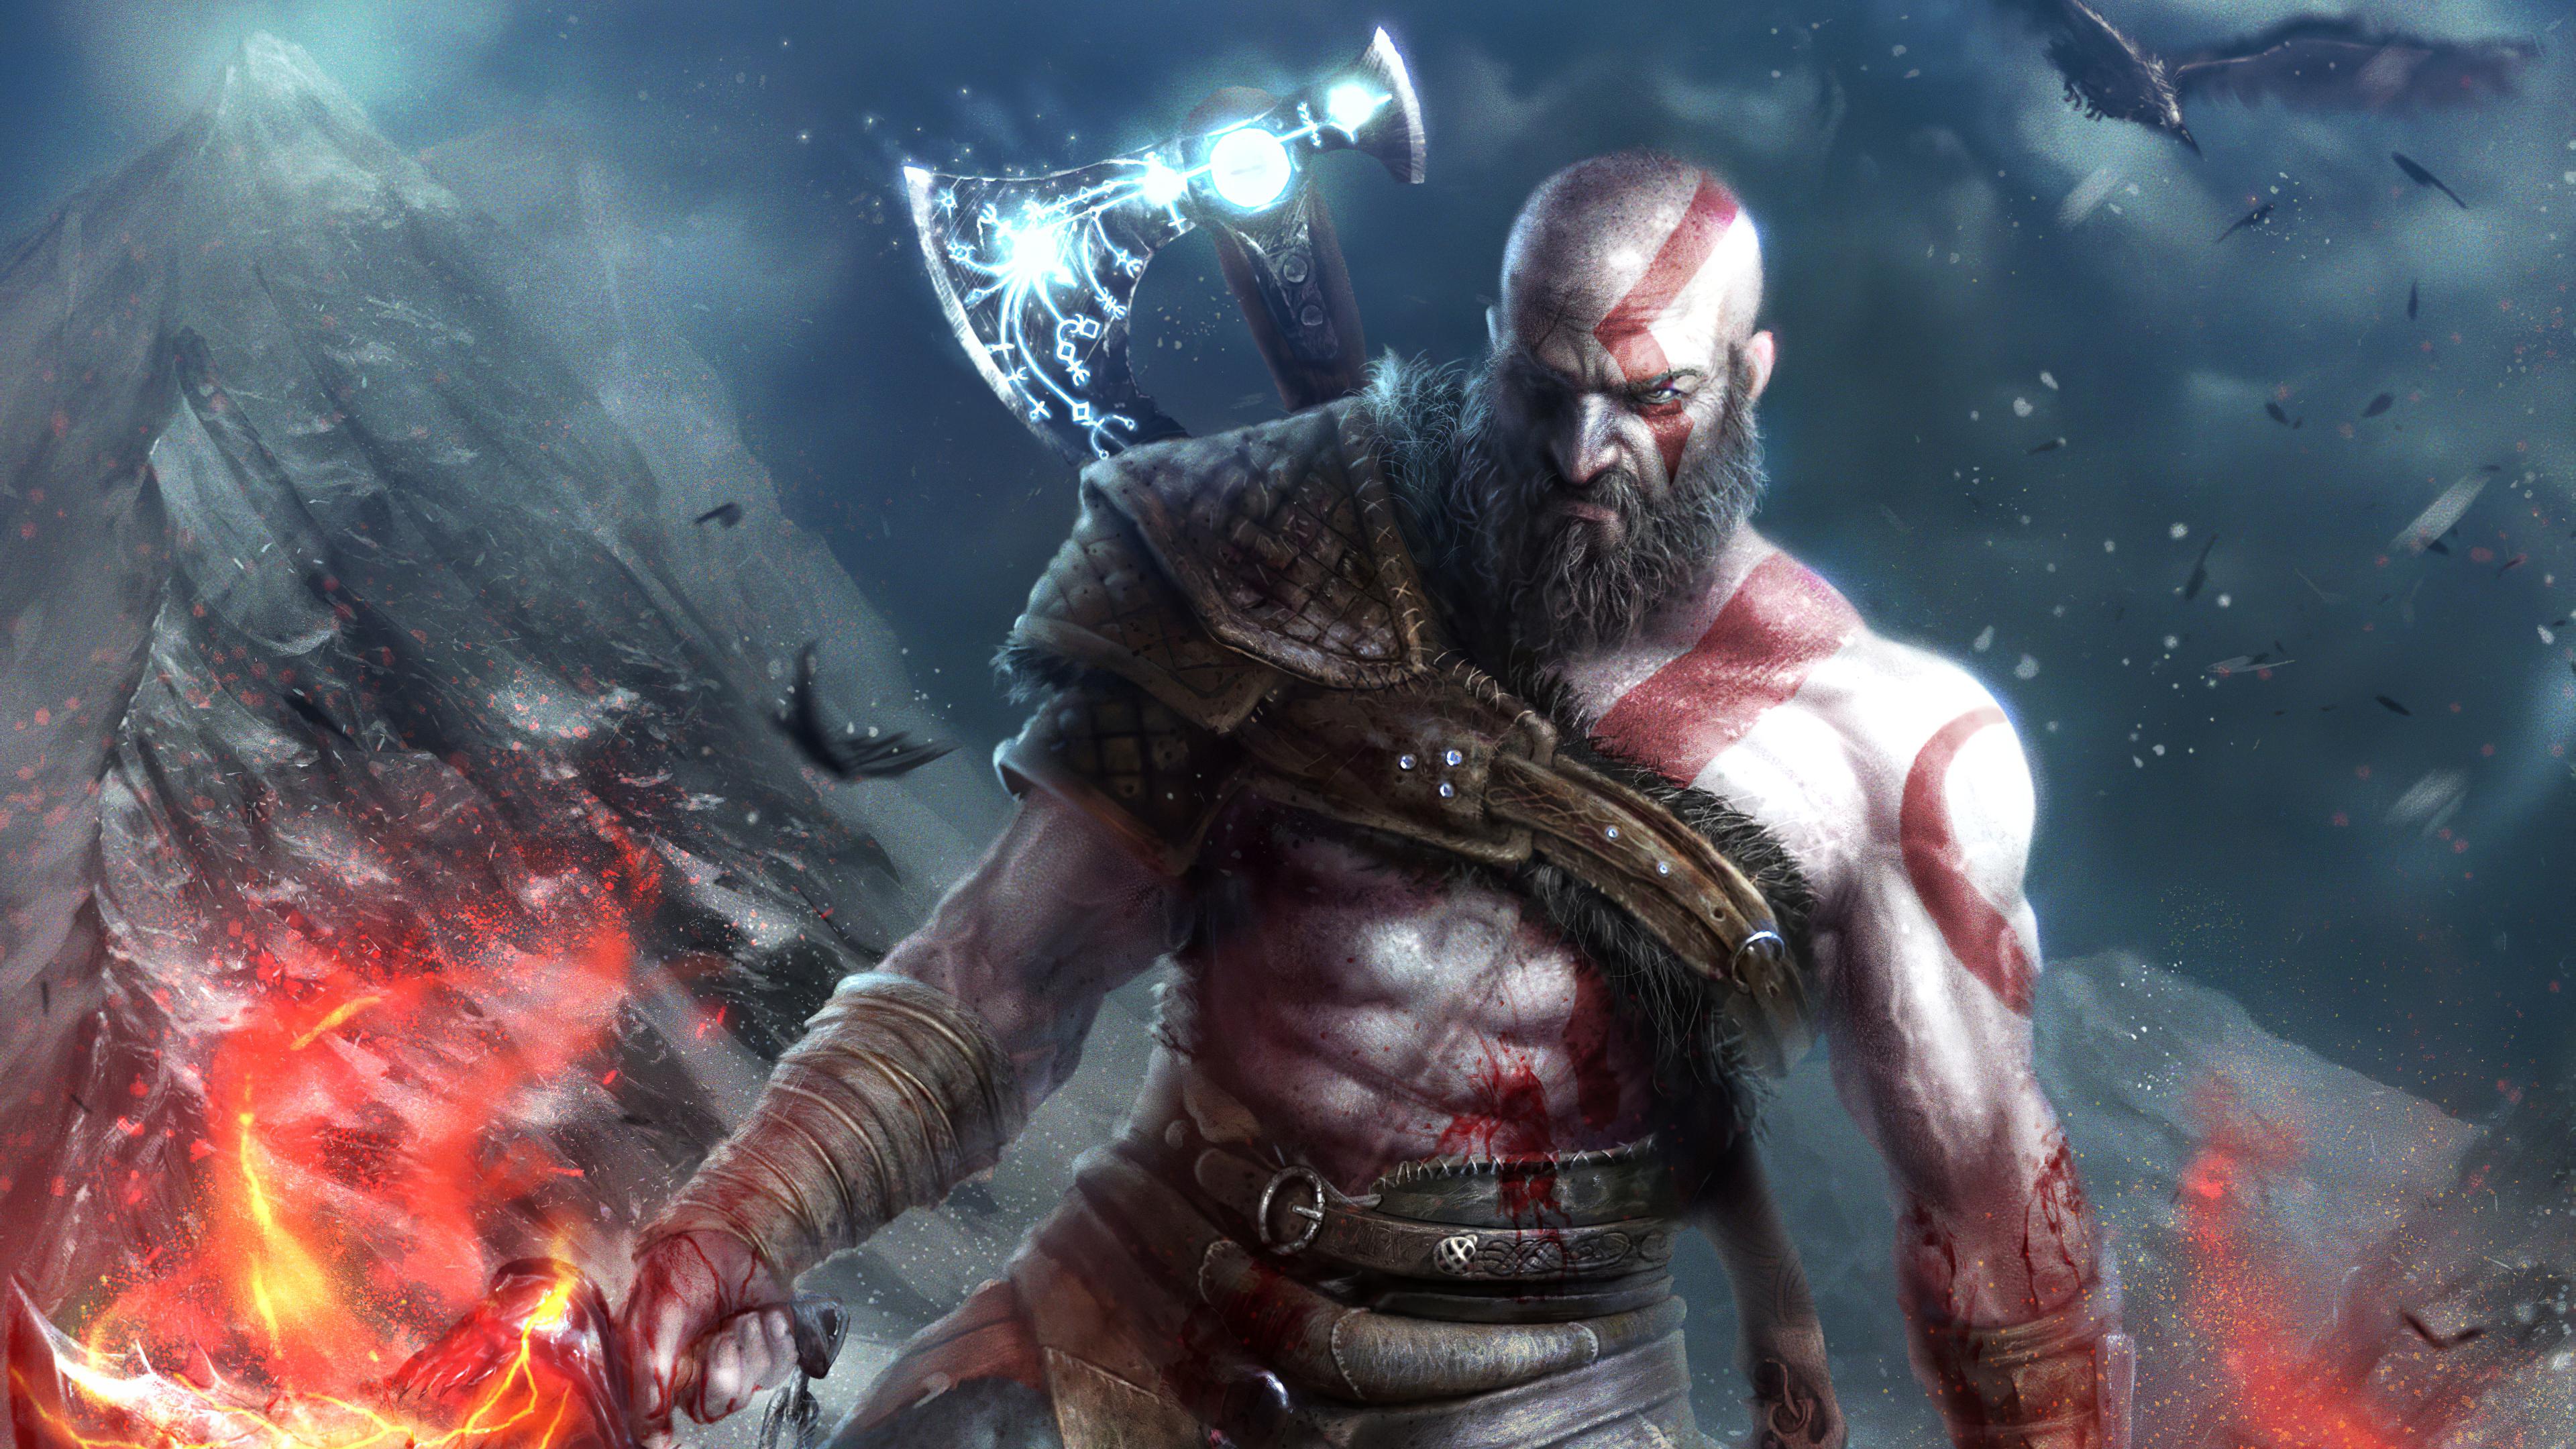 Wallpaper 4k Kratos God Of War Kratos God Of War 4k Wallpapers